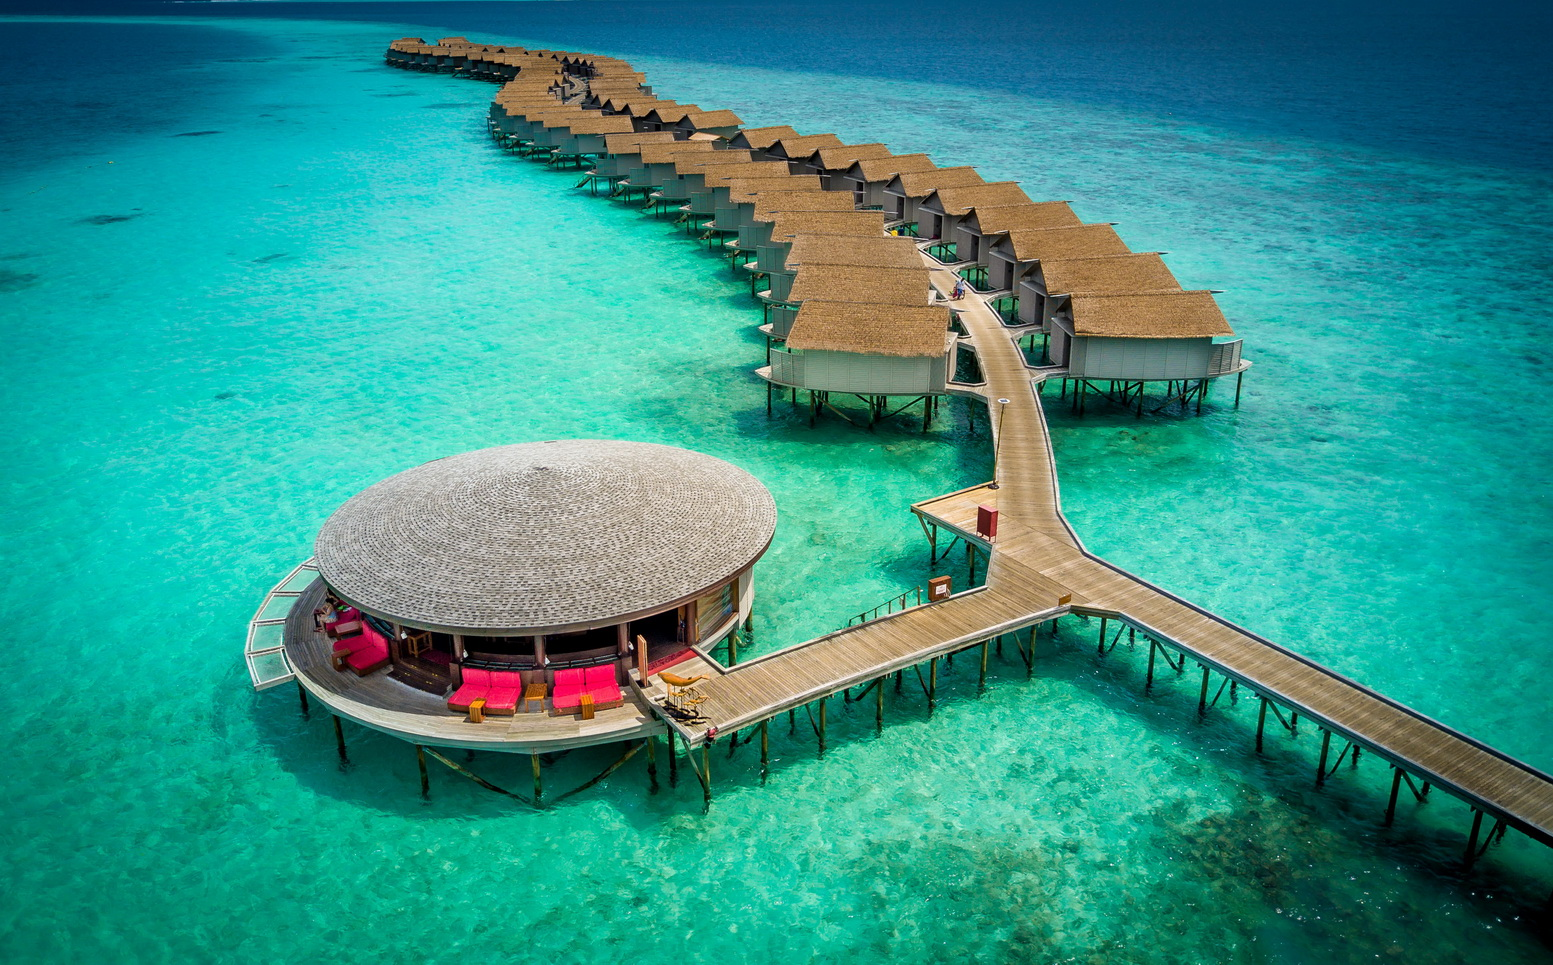 Centara Ras Fushi Resort & Spa Maldives (เซ็นทารา ราส ฟูชิ รีสอร์ทแอนด์สปา มัลดีฟส์) ไม่รวมตั๋วเครื่องบิน ราคาเริ่มต้น 22,400 บาท เหมาะสำหรับสายดำน้ำและความสงบส่วนตัว